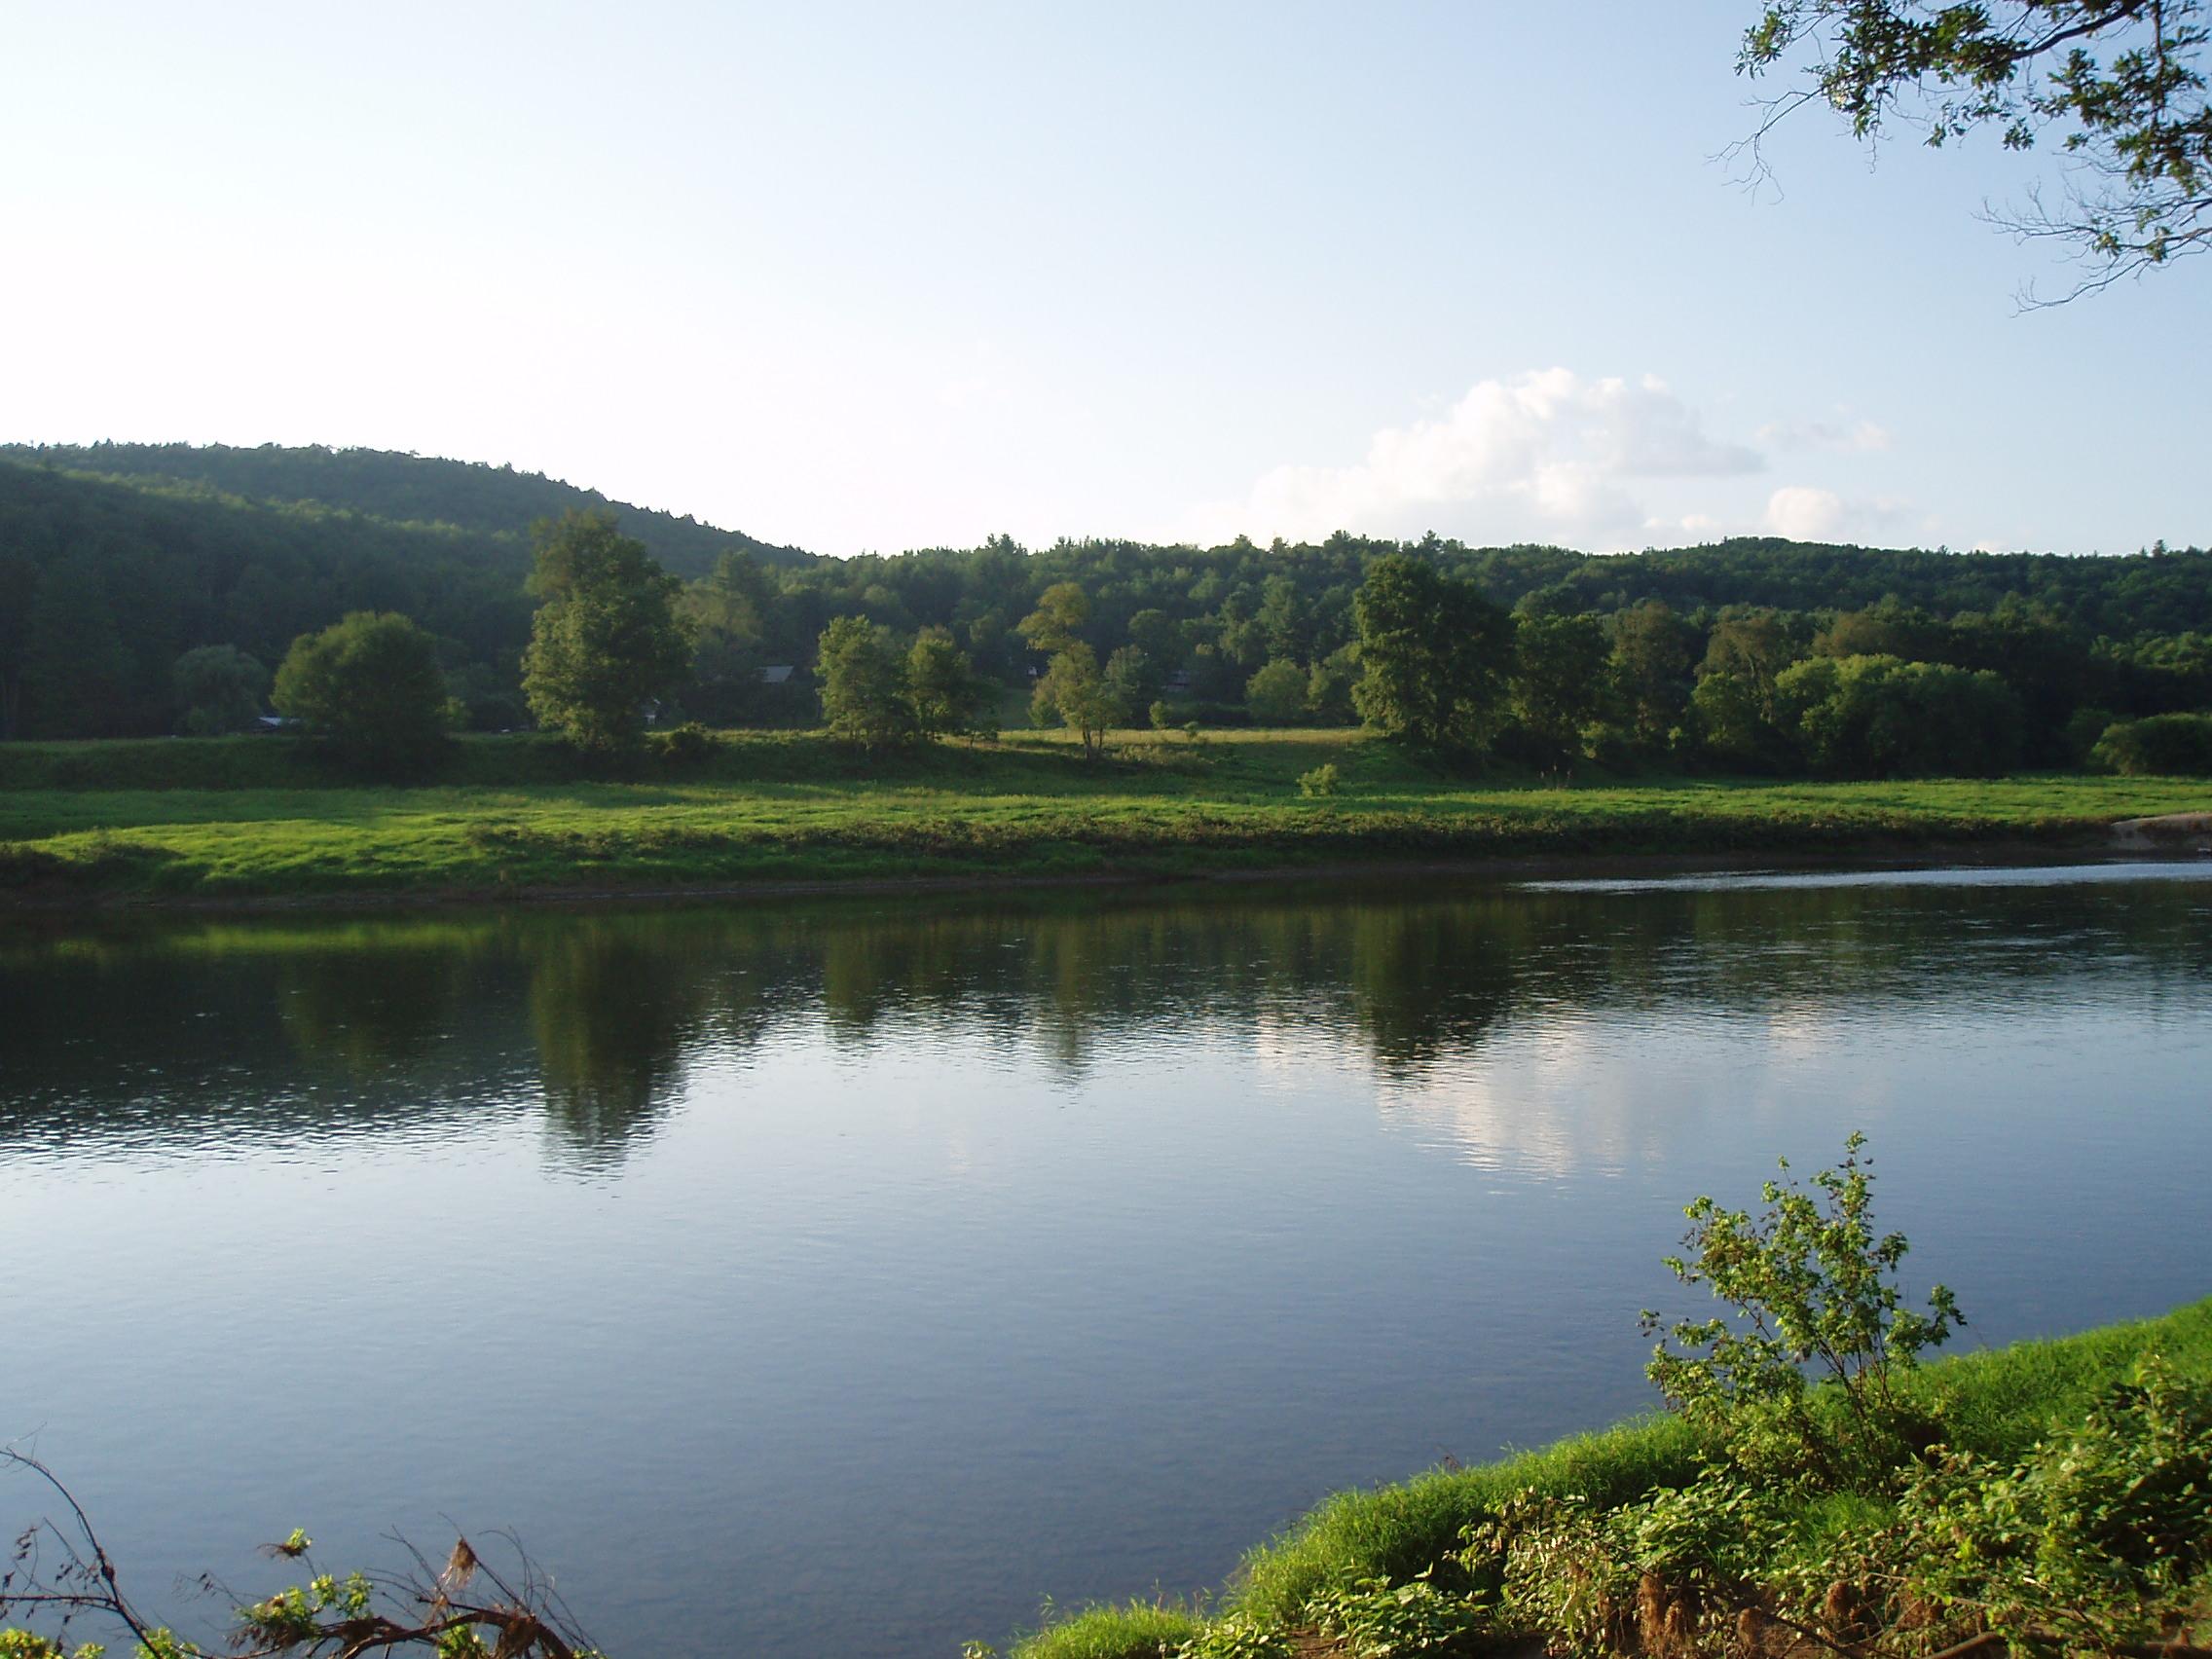 http://cacarrozza.com/wp-content/uploads/2010/07/Delaware-River1.jpg